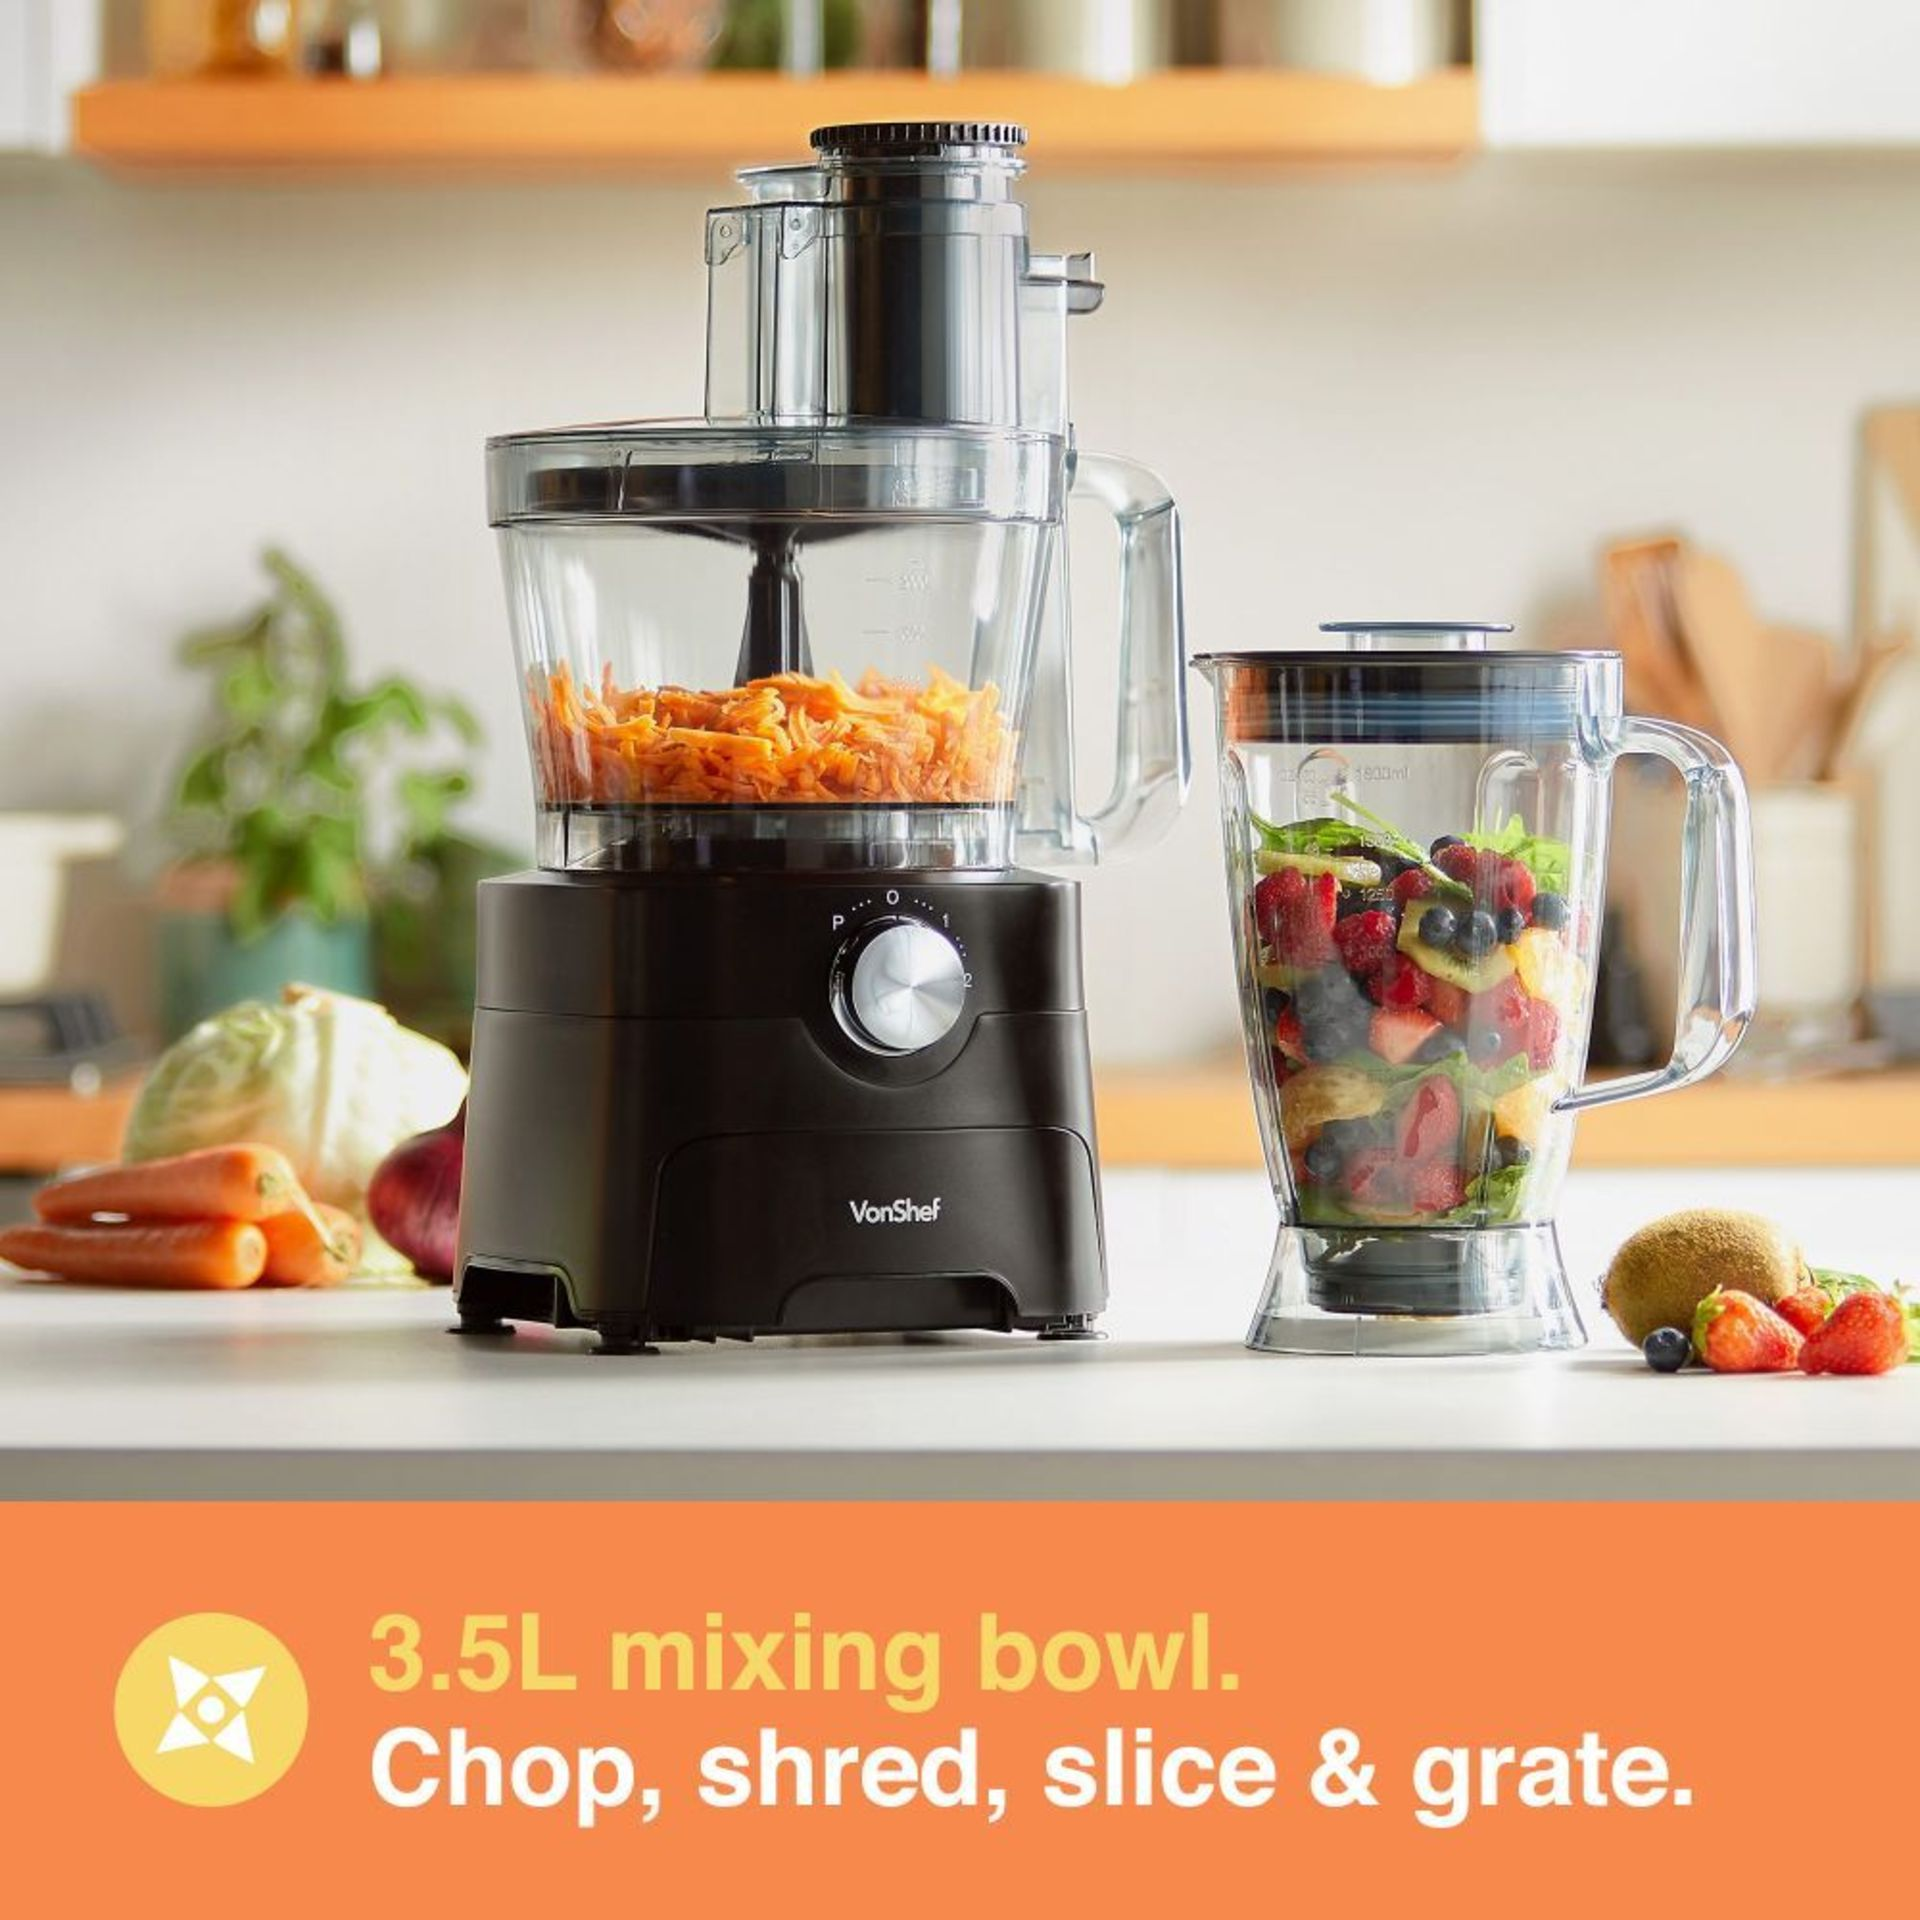 Los 55 - (KG30) 1000W Food Processor. Chop, blend, mix, purée, grate, shred and knead dough Process bi...